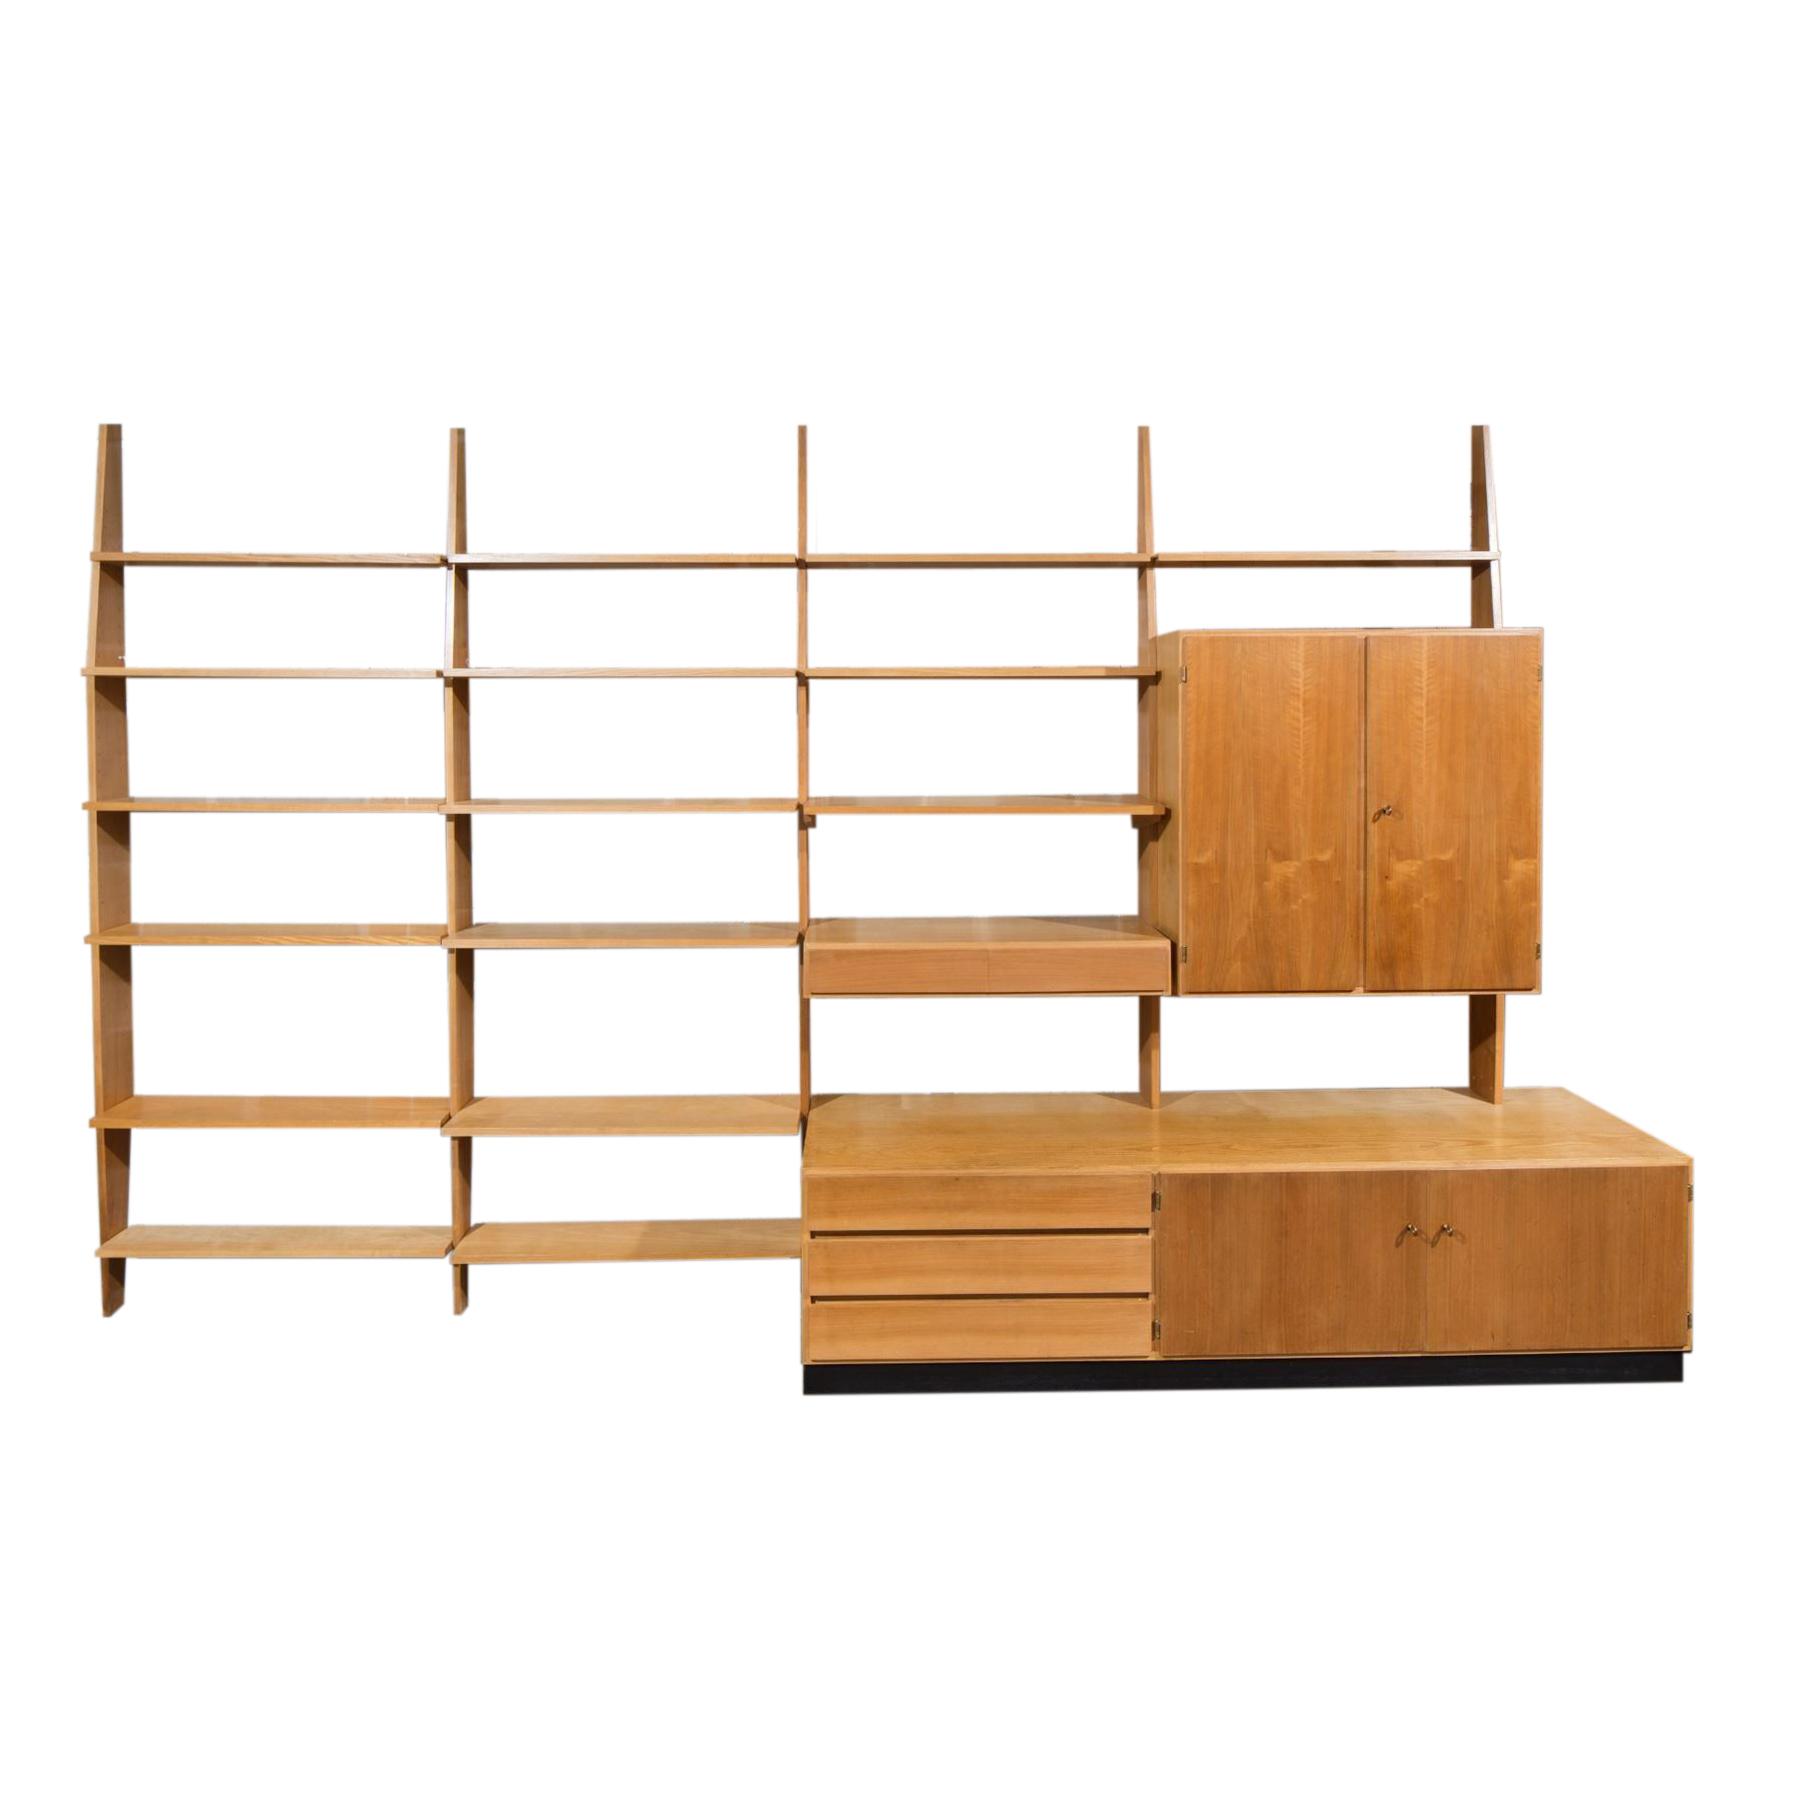 waeckerlin sideboard wall unit vintage idealheim